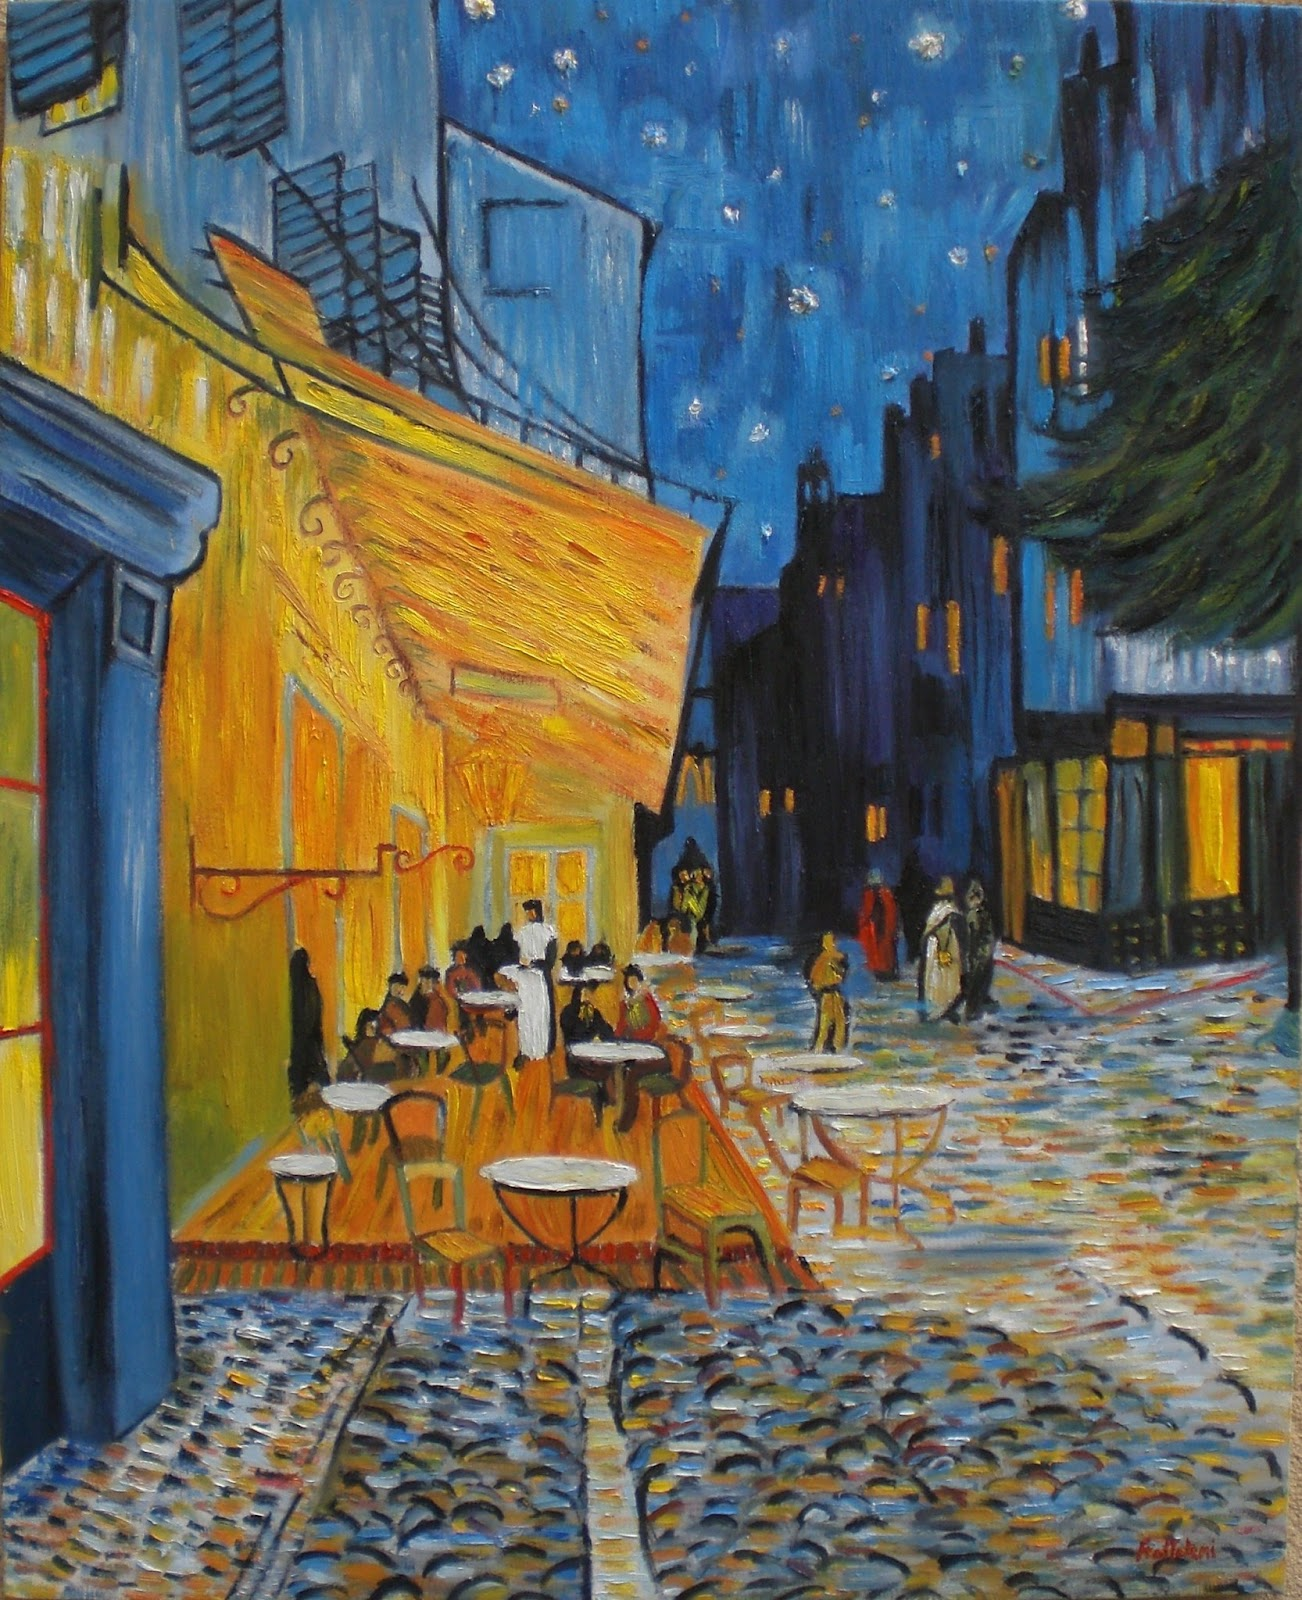 Angela Frattalemi Van Gogh Terrazza del caff la sera